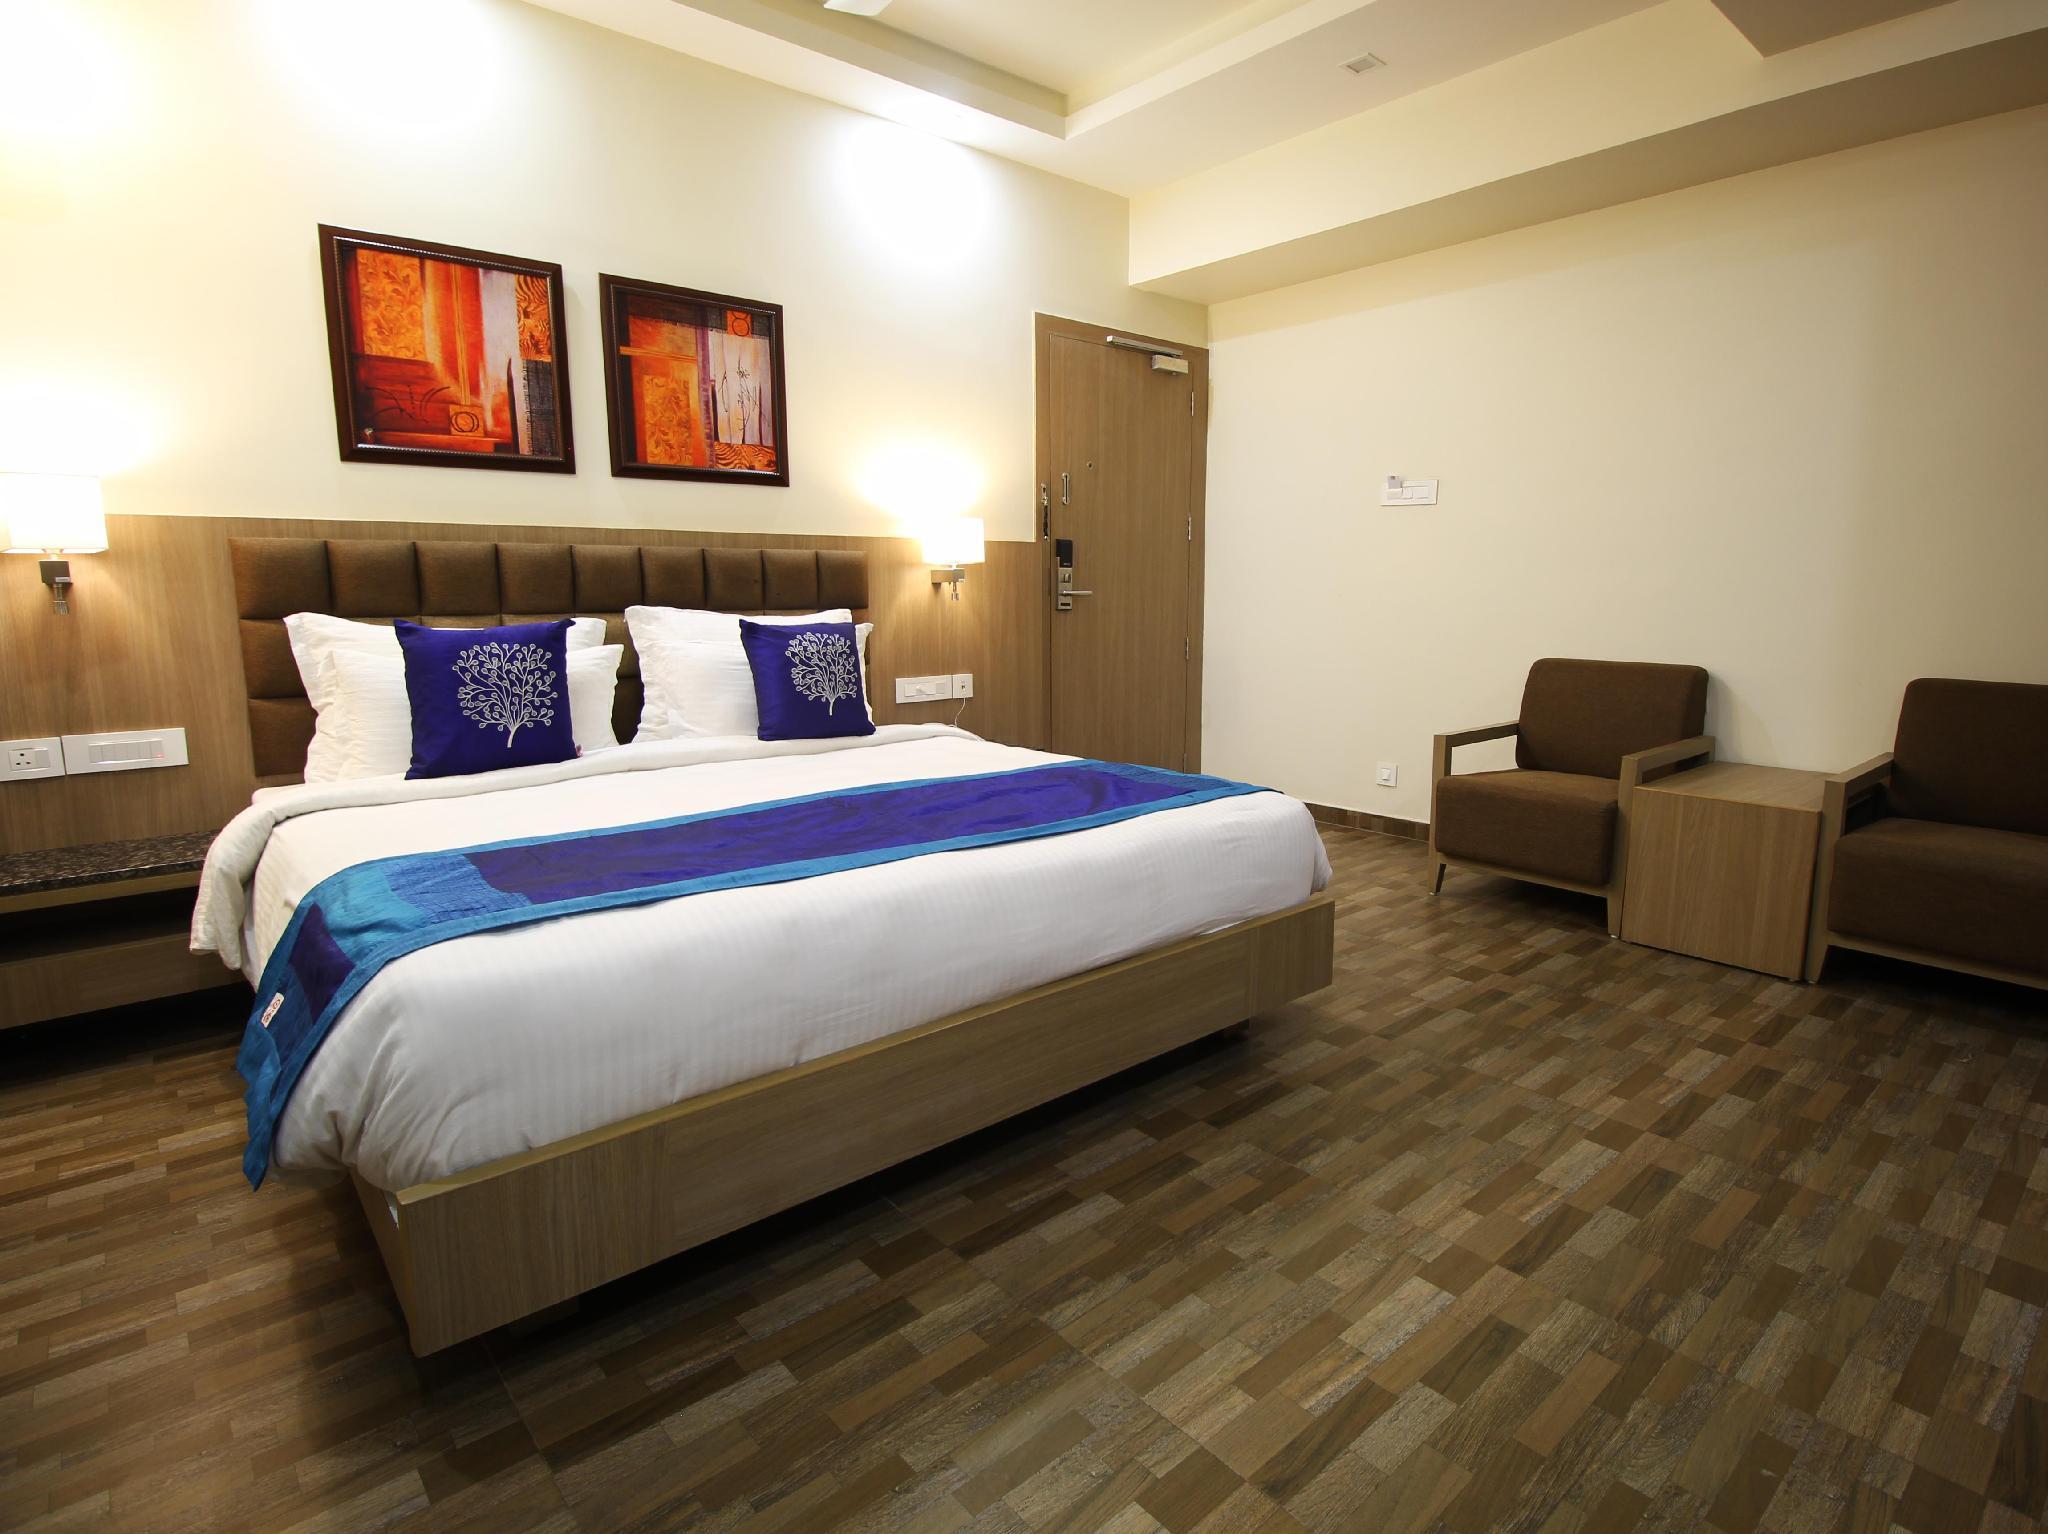 Hotel Nova Kd Comfort Virgo The Grand Bansi Page 3 Hotelfrance24com